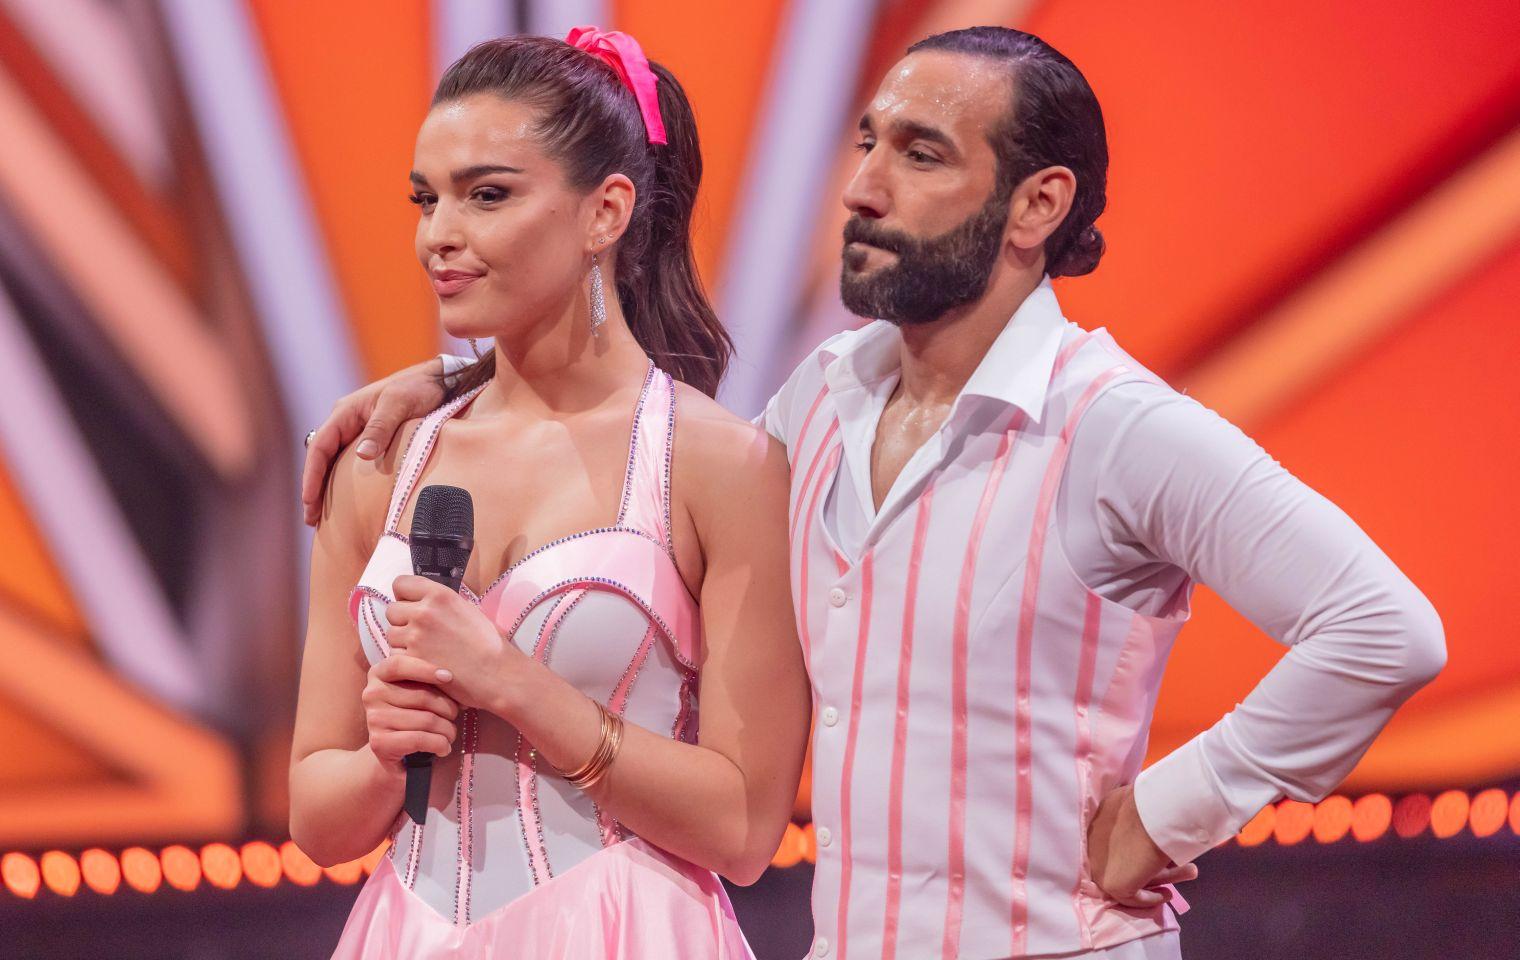 Let's Dance: Profi Massimo Sinató ist doch dabei! - TVMovie.de